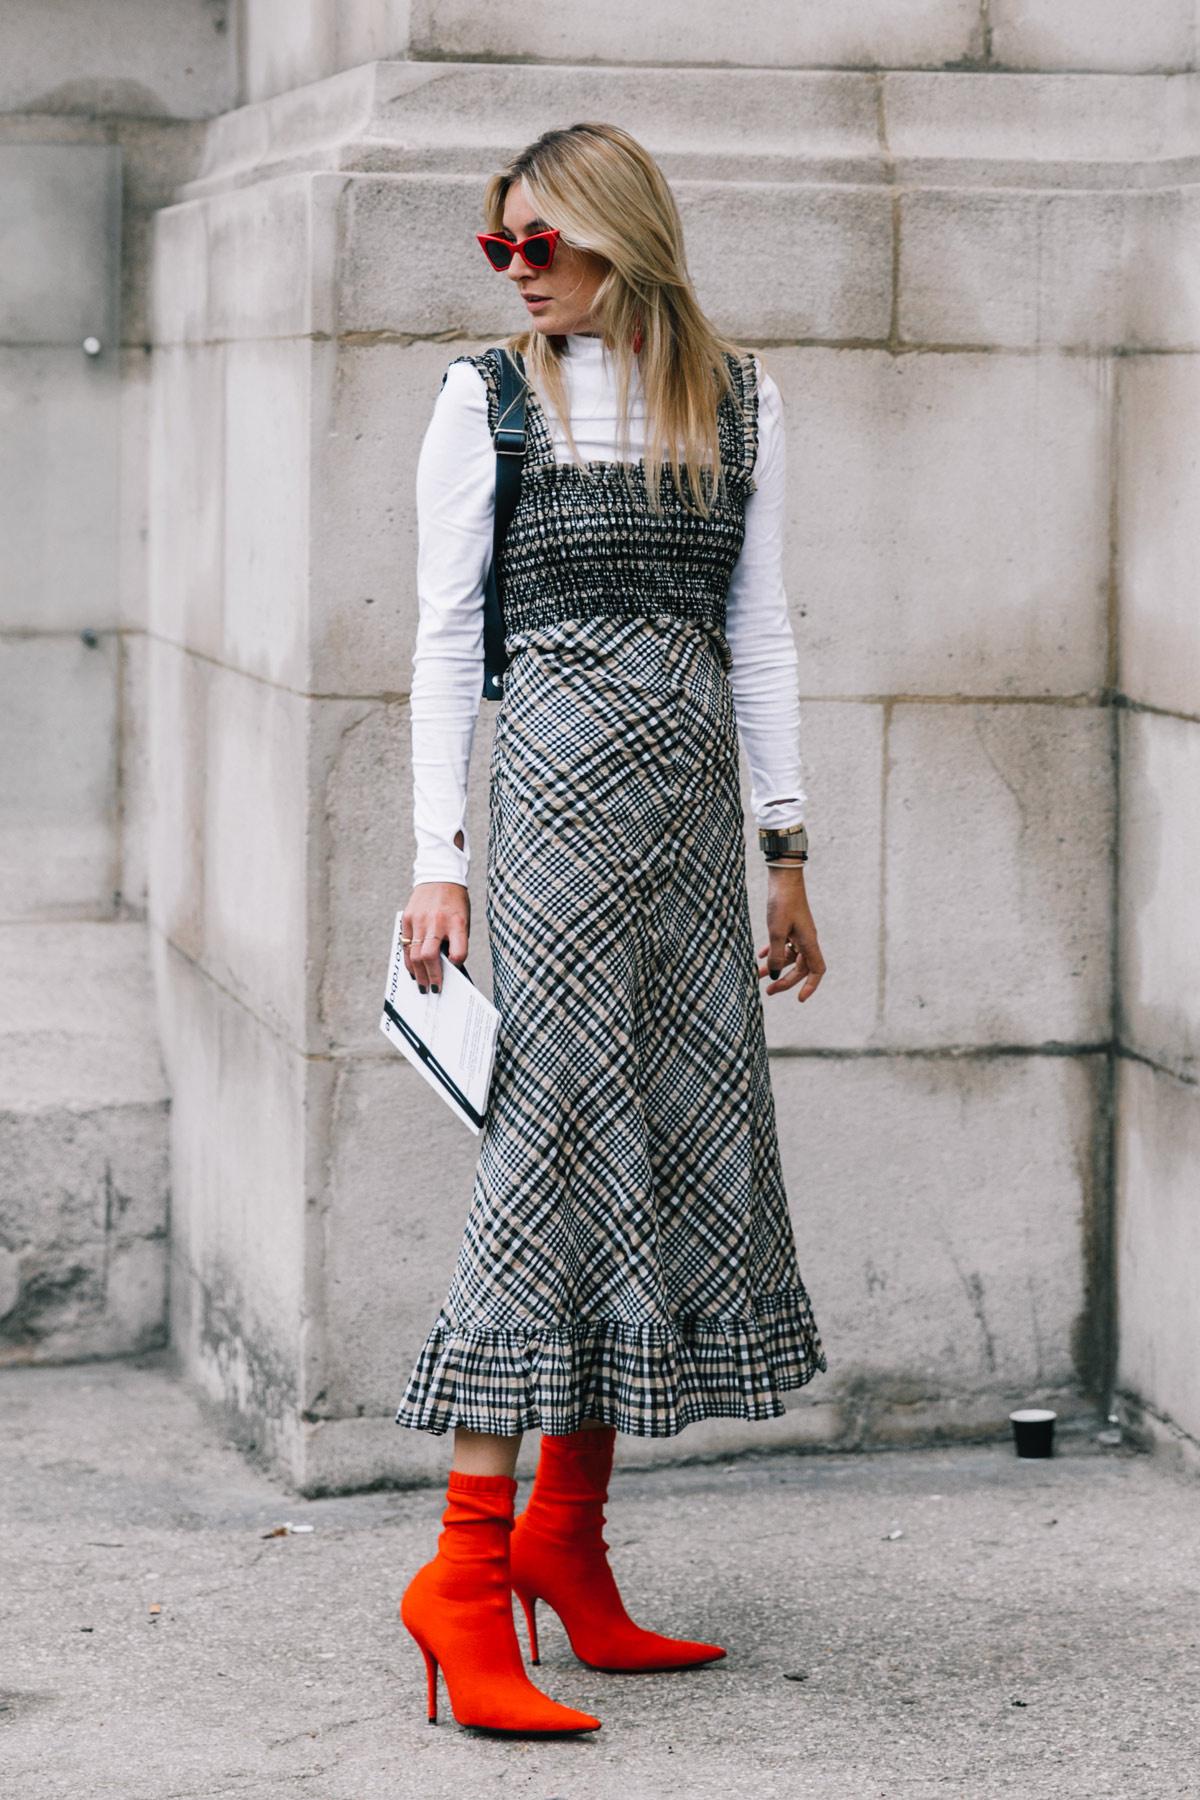 street_style_paris_fashion_week_dia3_balmain_chloe_isabel_maran_184081343_1200x1800